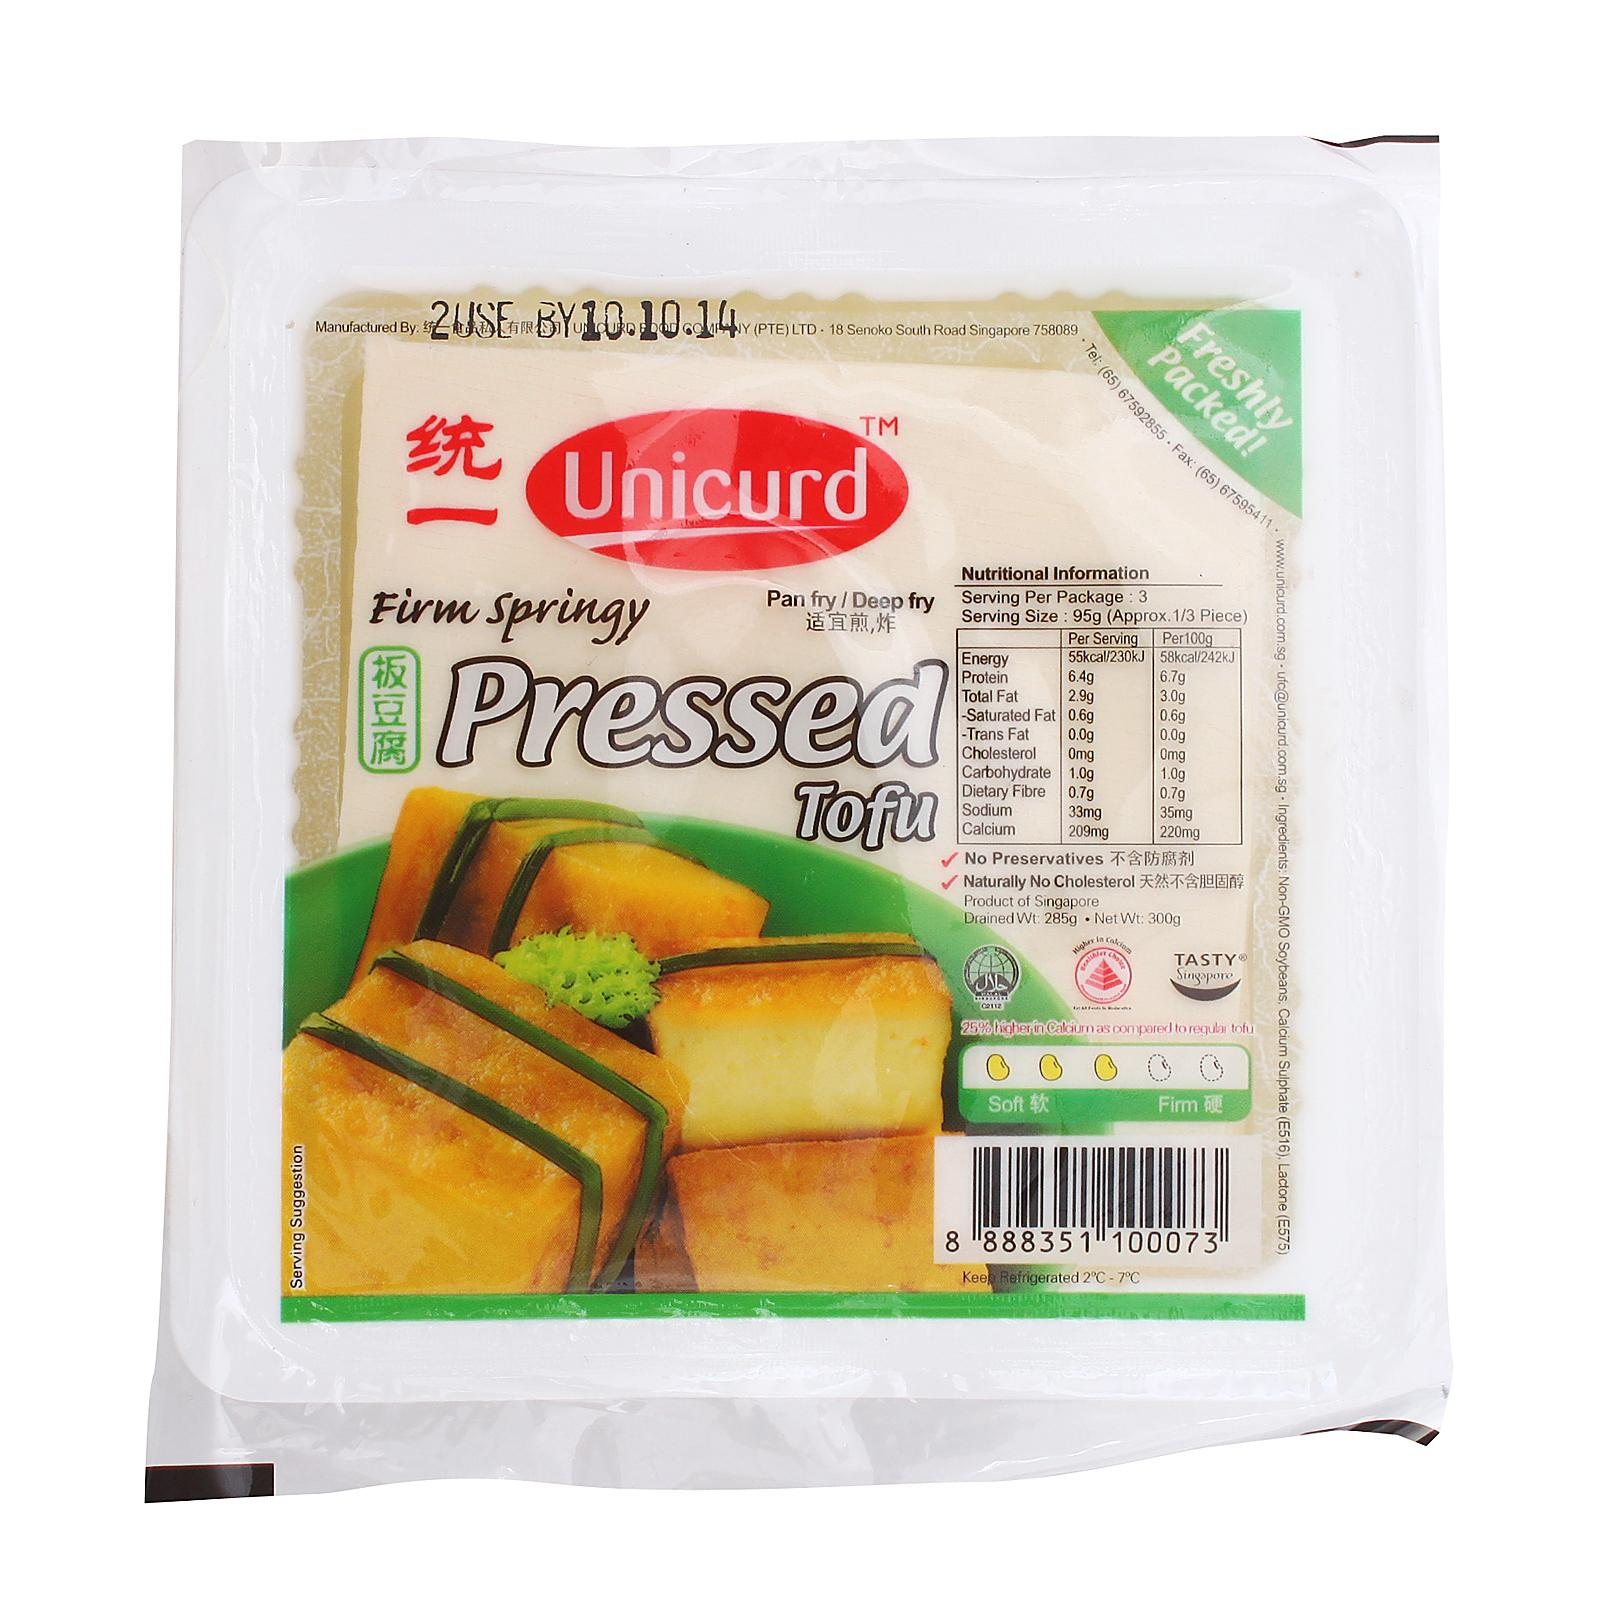 UNICURD Tofu Pressed 300g